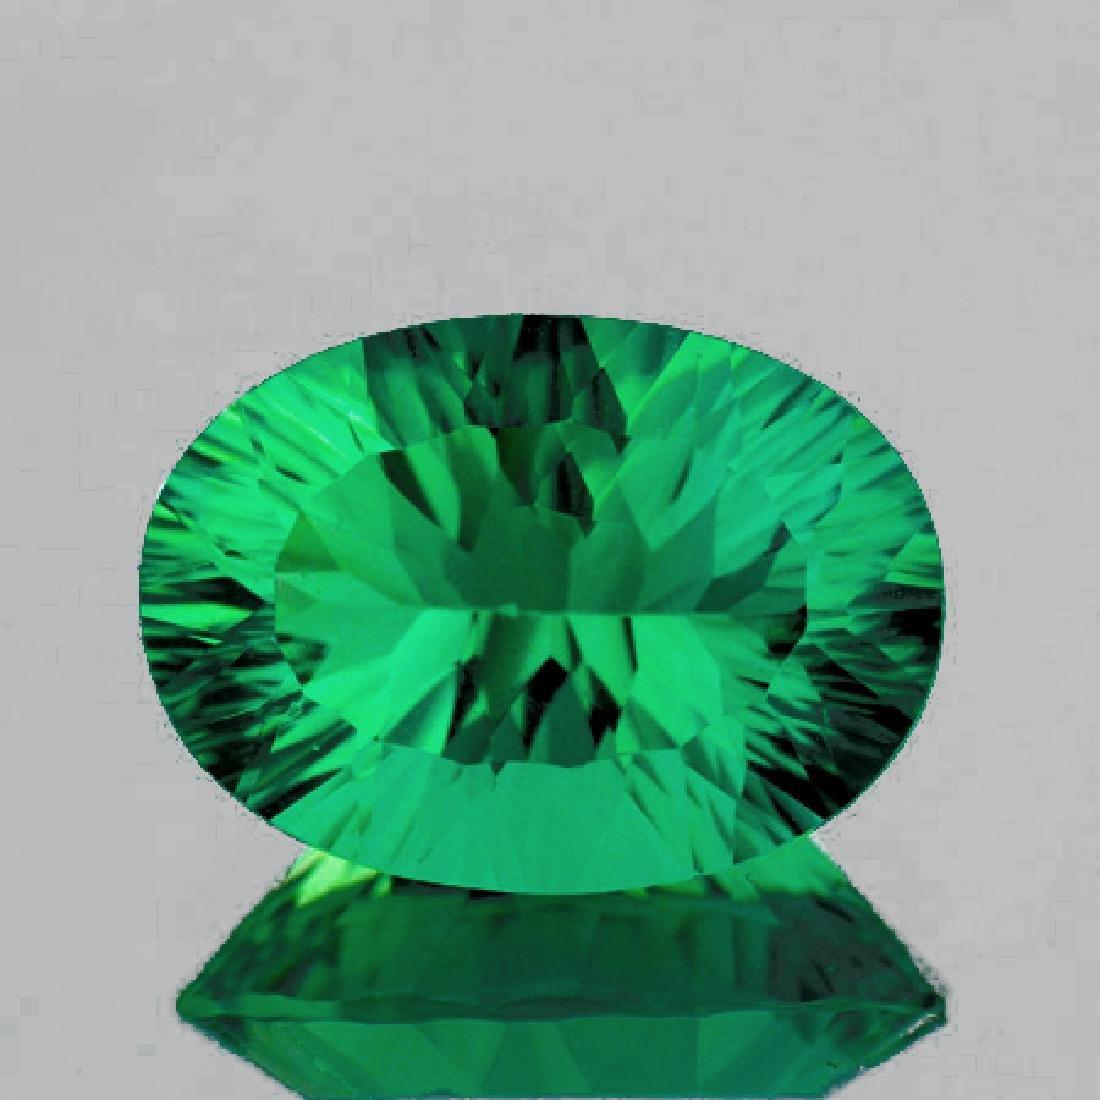 Natural Emerald Green Fluorite 14.93 Ct - FL